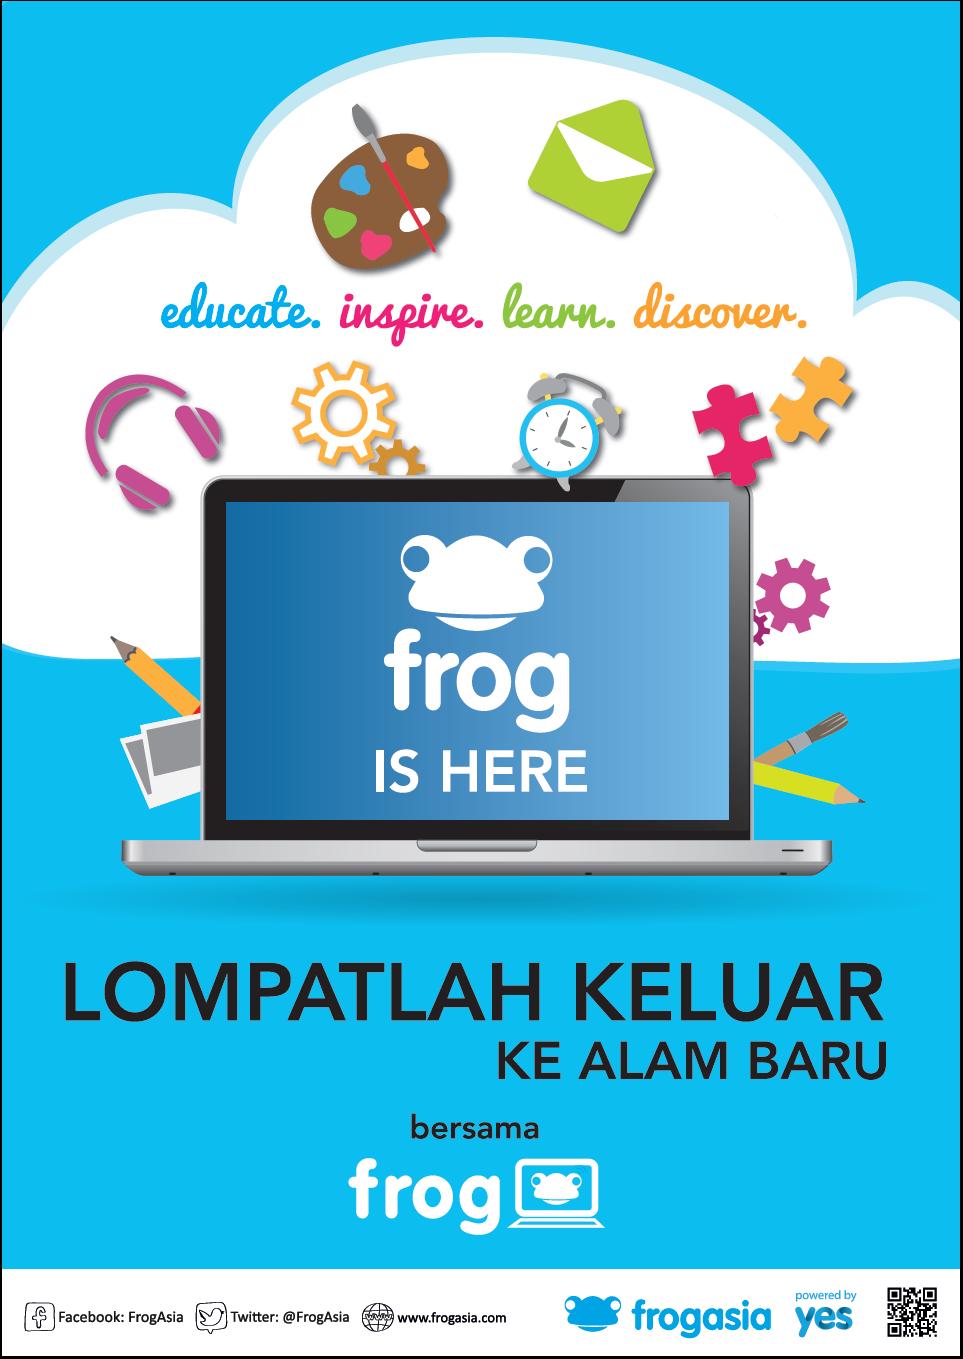 V Frog Kpm Blog Rasmi Sekolah Keb...